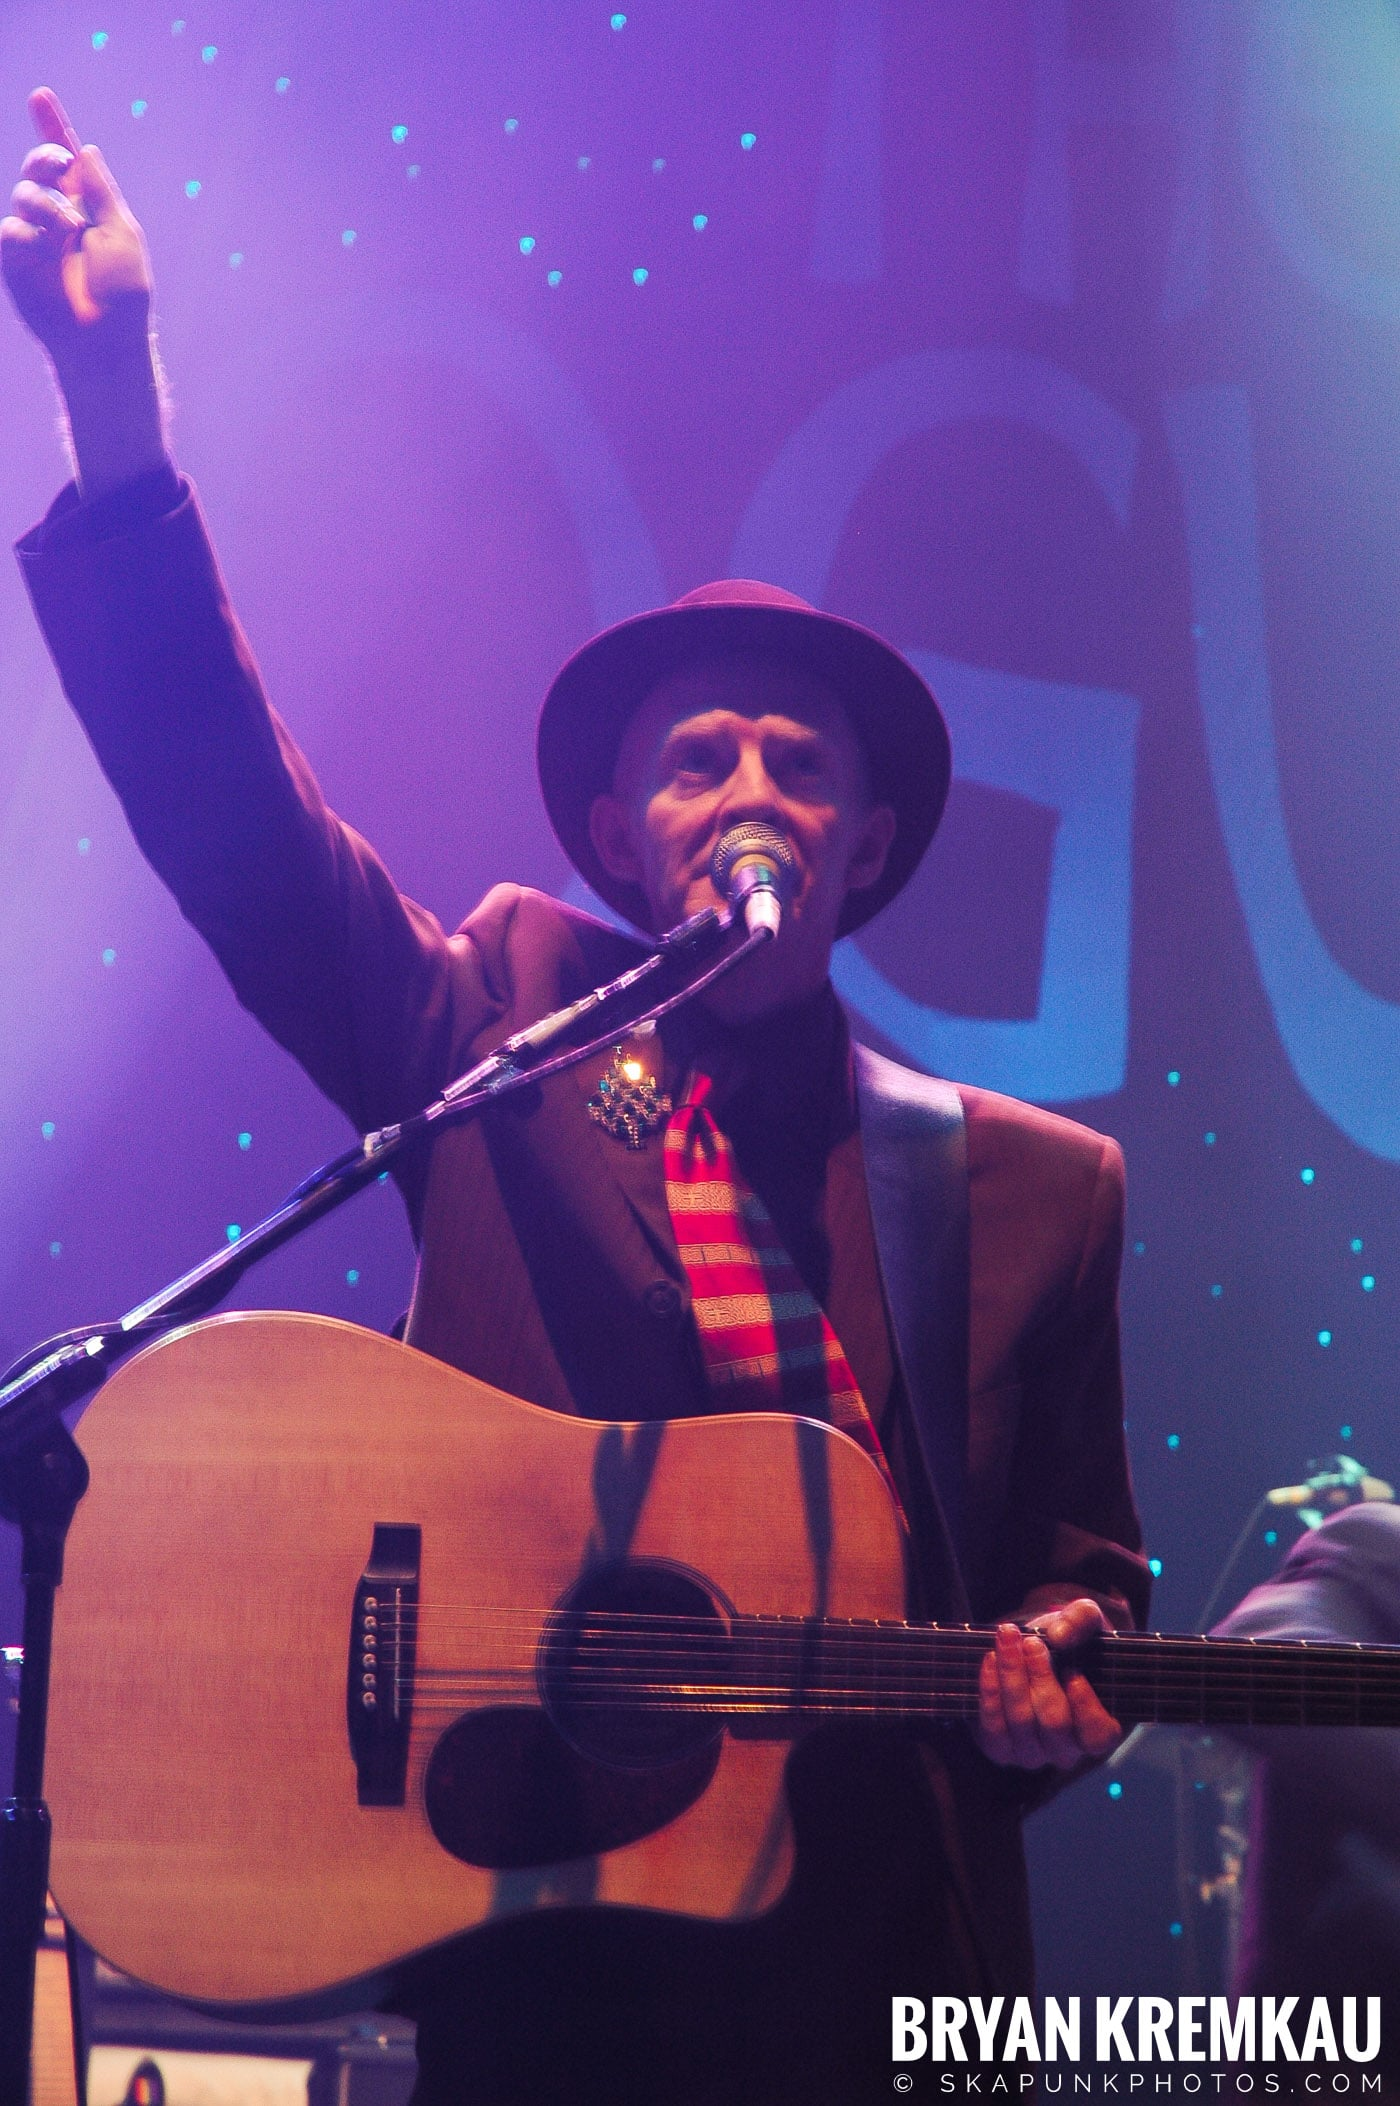 The Pogues @ Brixton Academy, London UK - 12.19.05 (16)